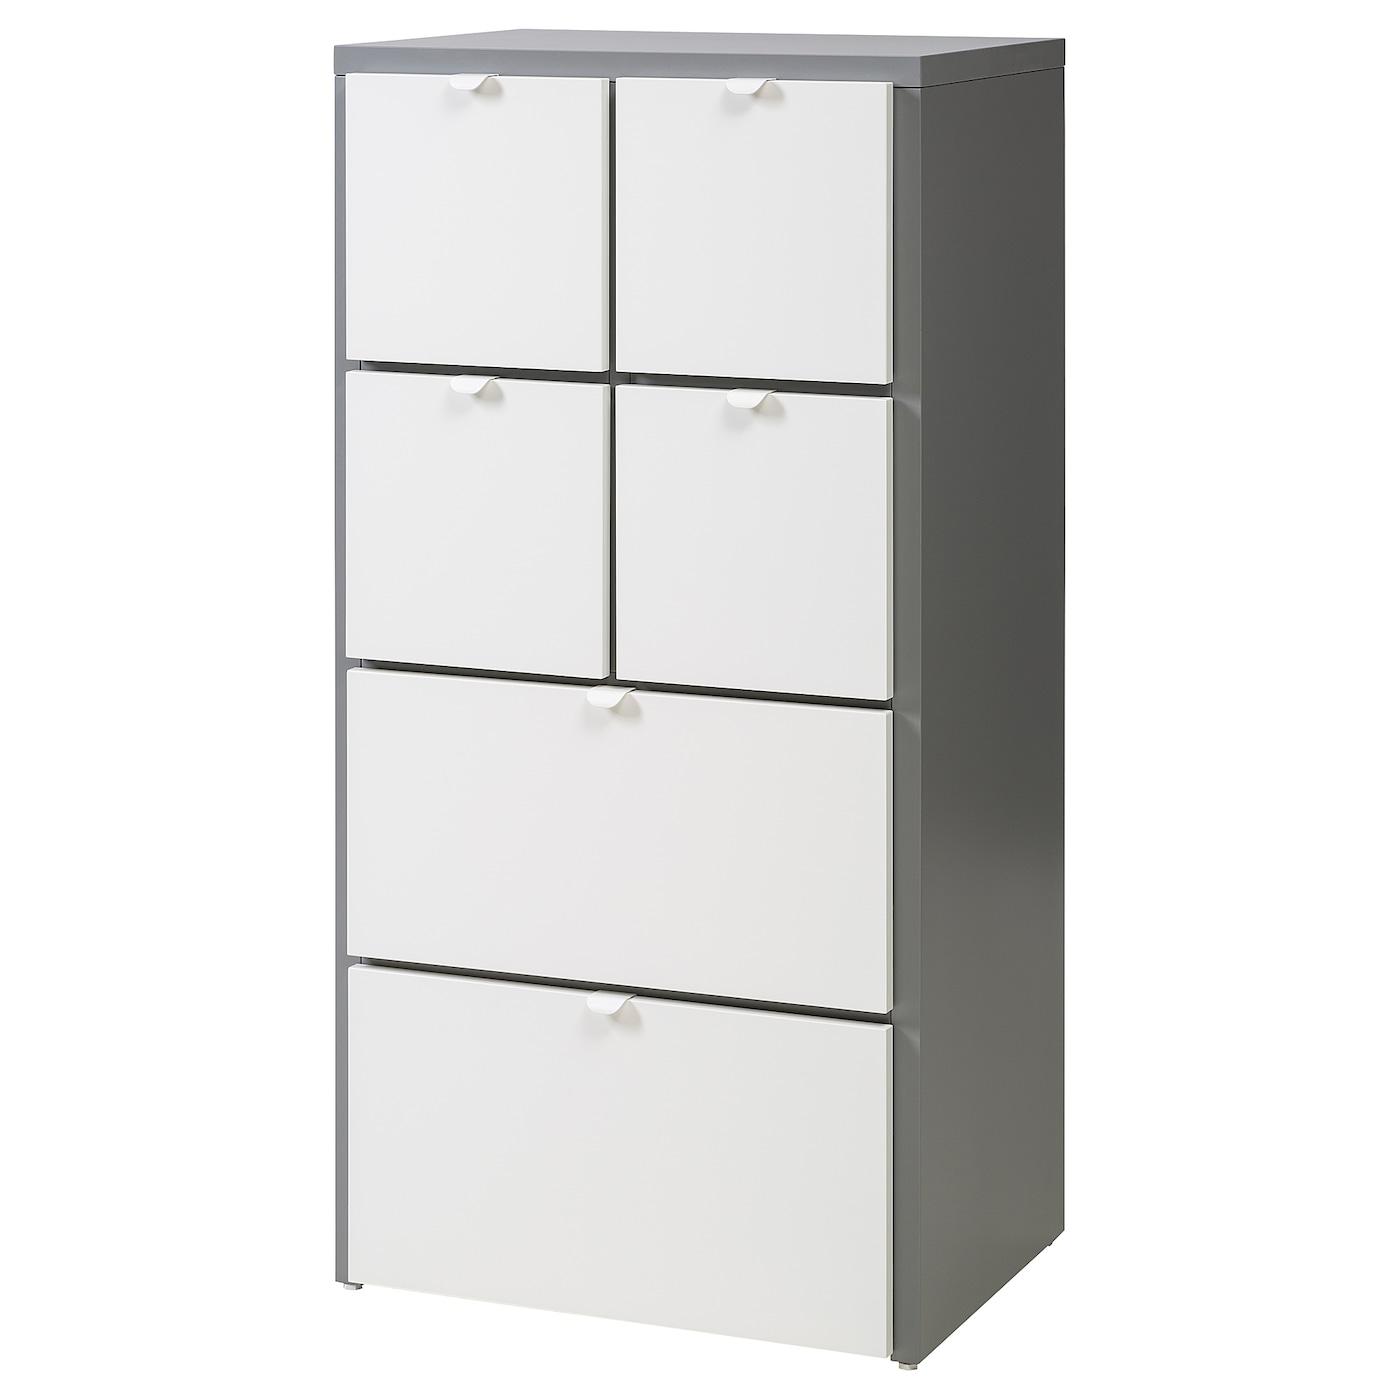 visthus commode 6 tiroirs gris blanc 63x126 cm ikea. Black Bedroom Furniture Sets. Home Design Ideas